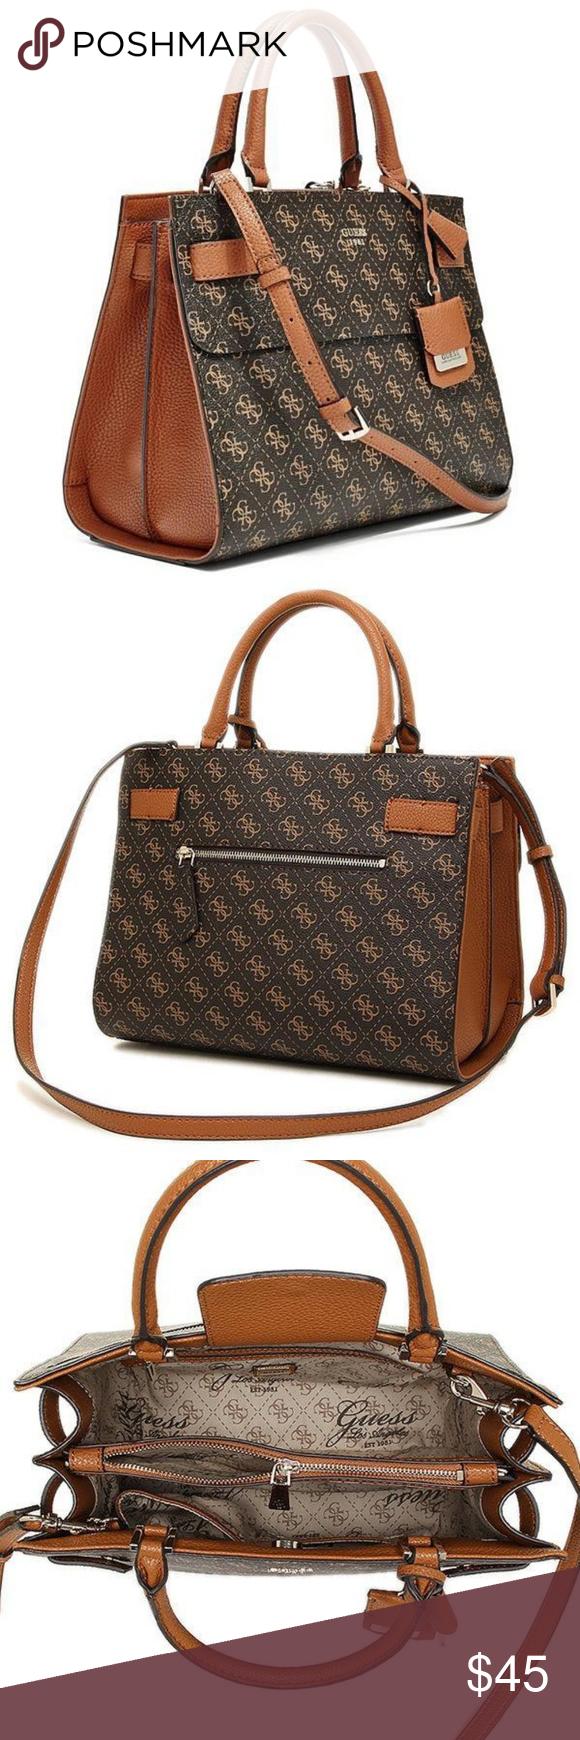 5edfb7c6fa72 Guess 1981 Black Brown Satchel Handbag Brand new Guess 1981 Black Brown  Satchel Handbag